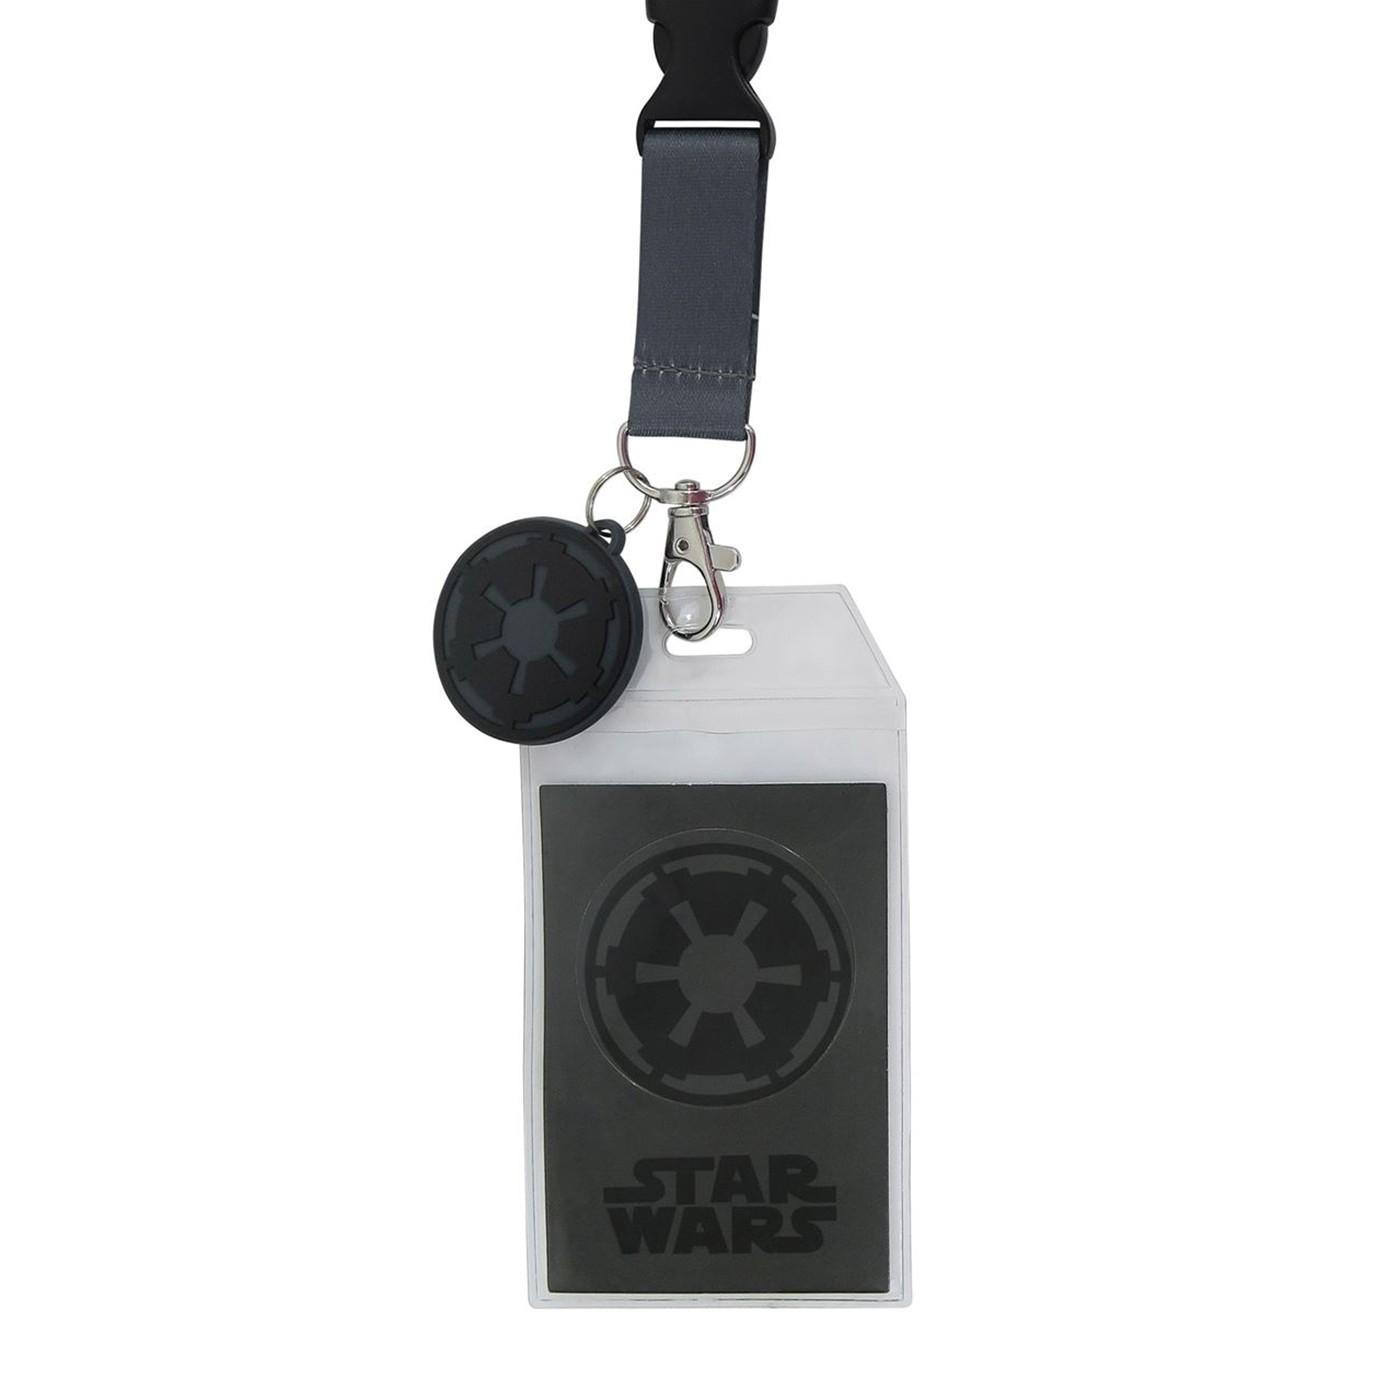 Star Wars Darth Vader Costume Lanyard with PVC Charm